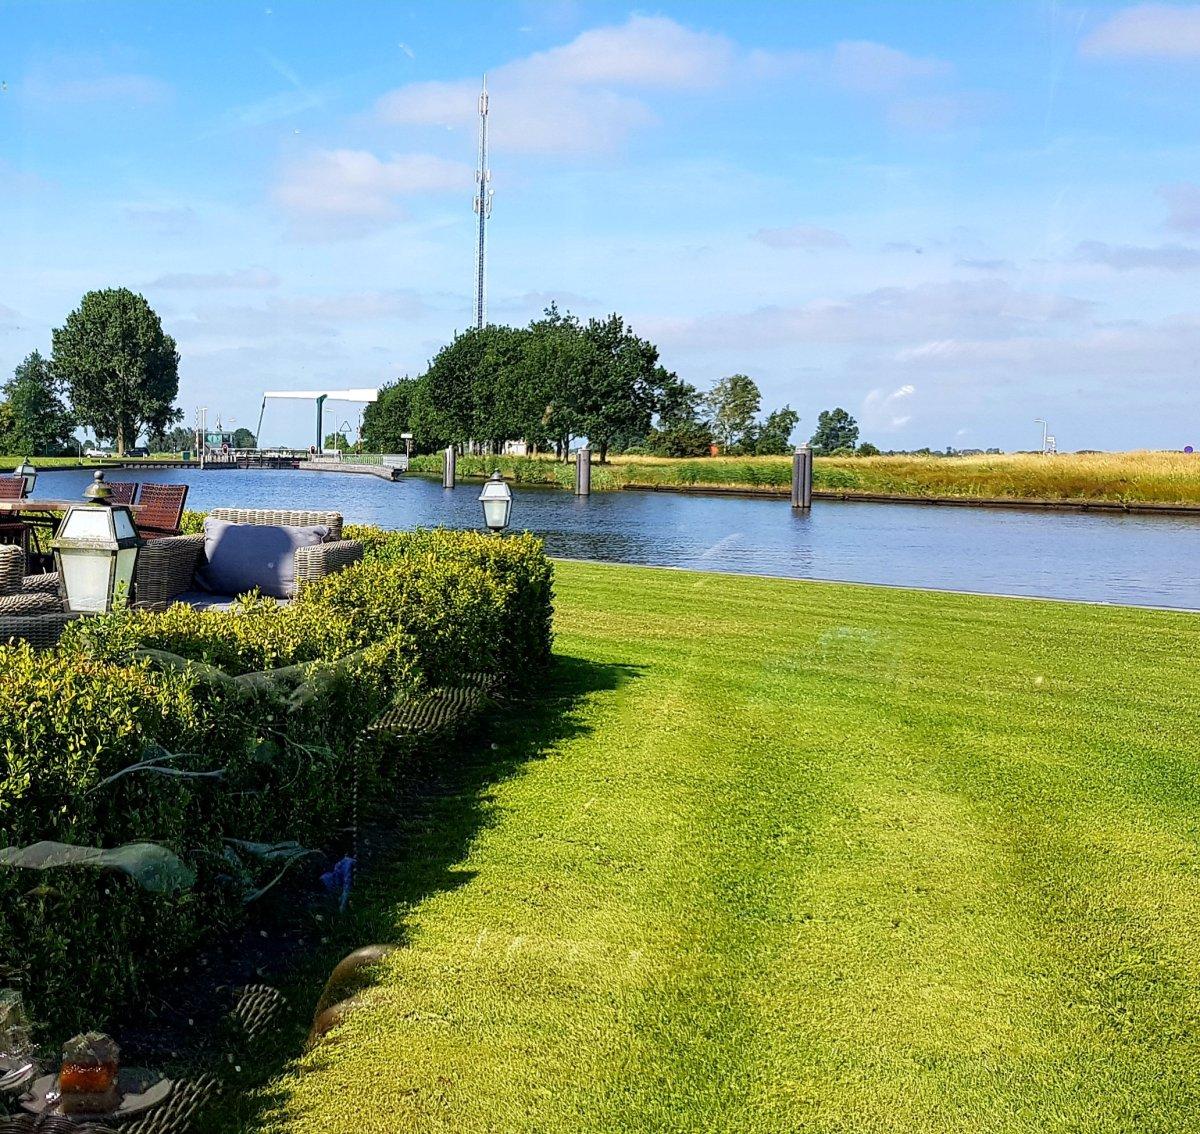 In Zonnig Zuid Friesland. Dag 2 Blokzijl - Haskerhorne 78 km